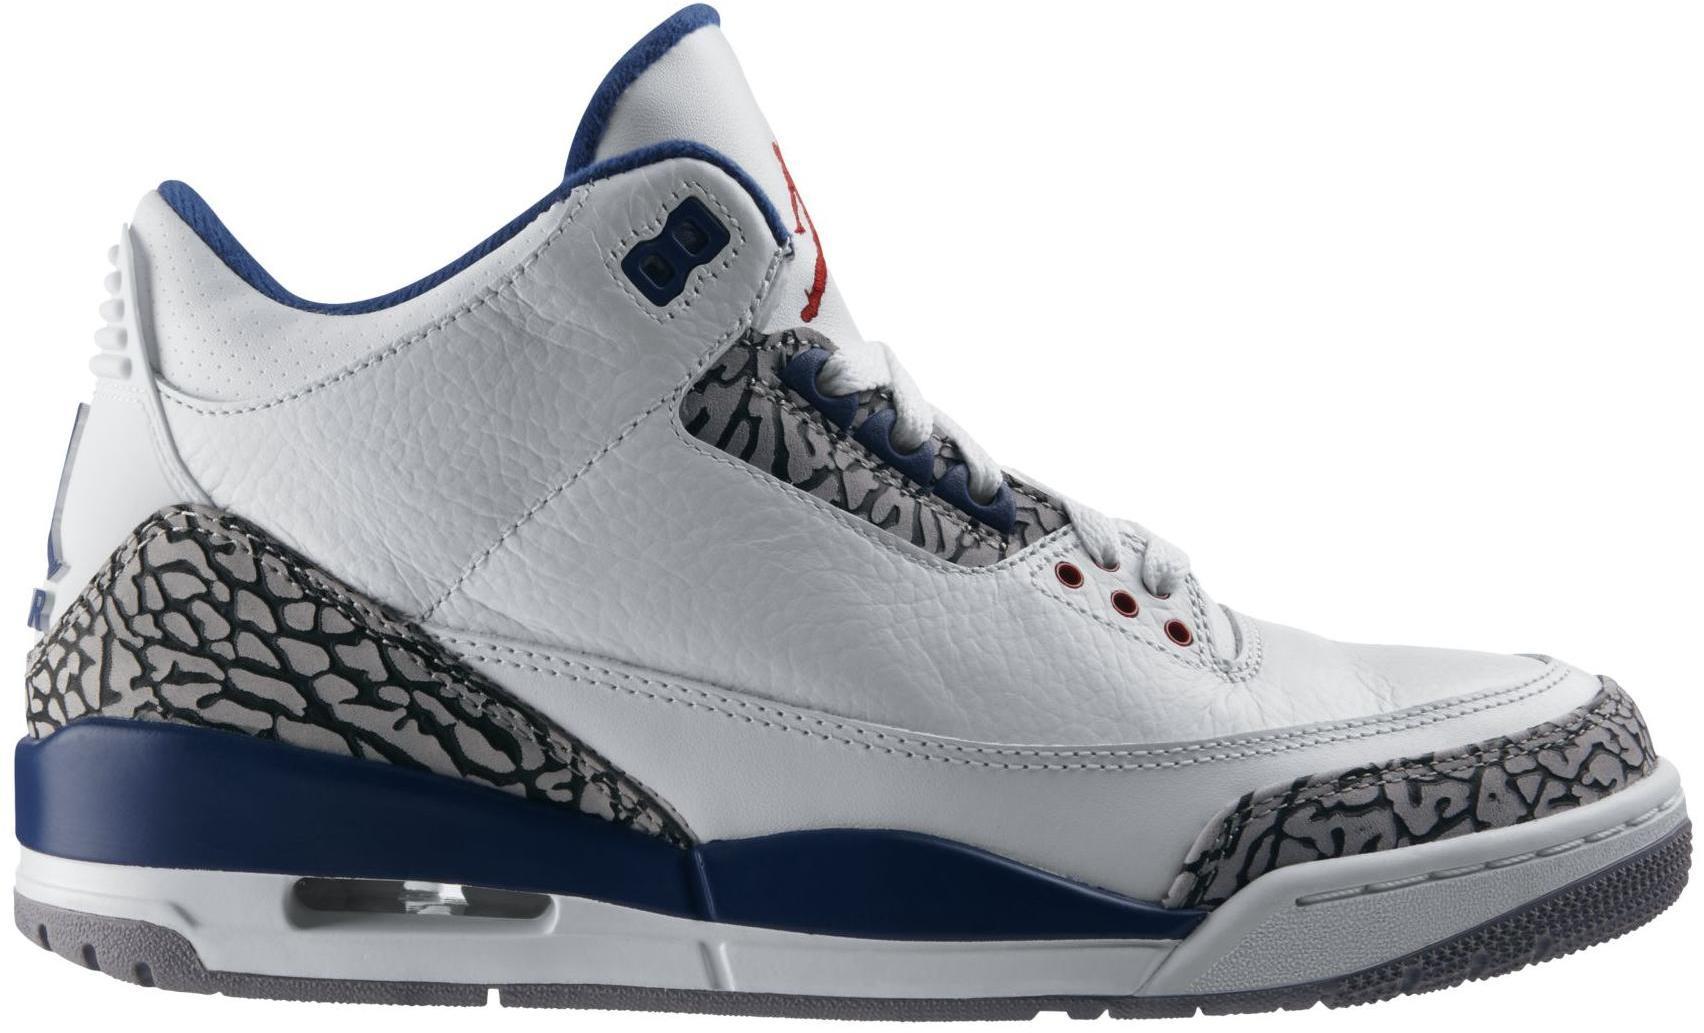 Jordan 3 Retro True Blue (2011